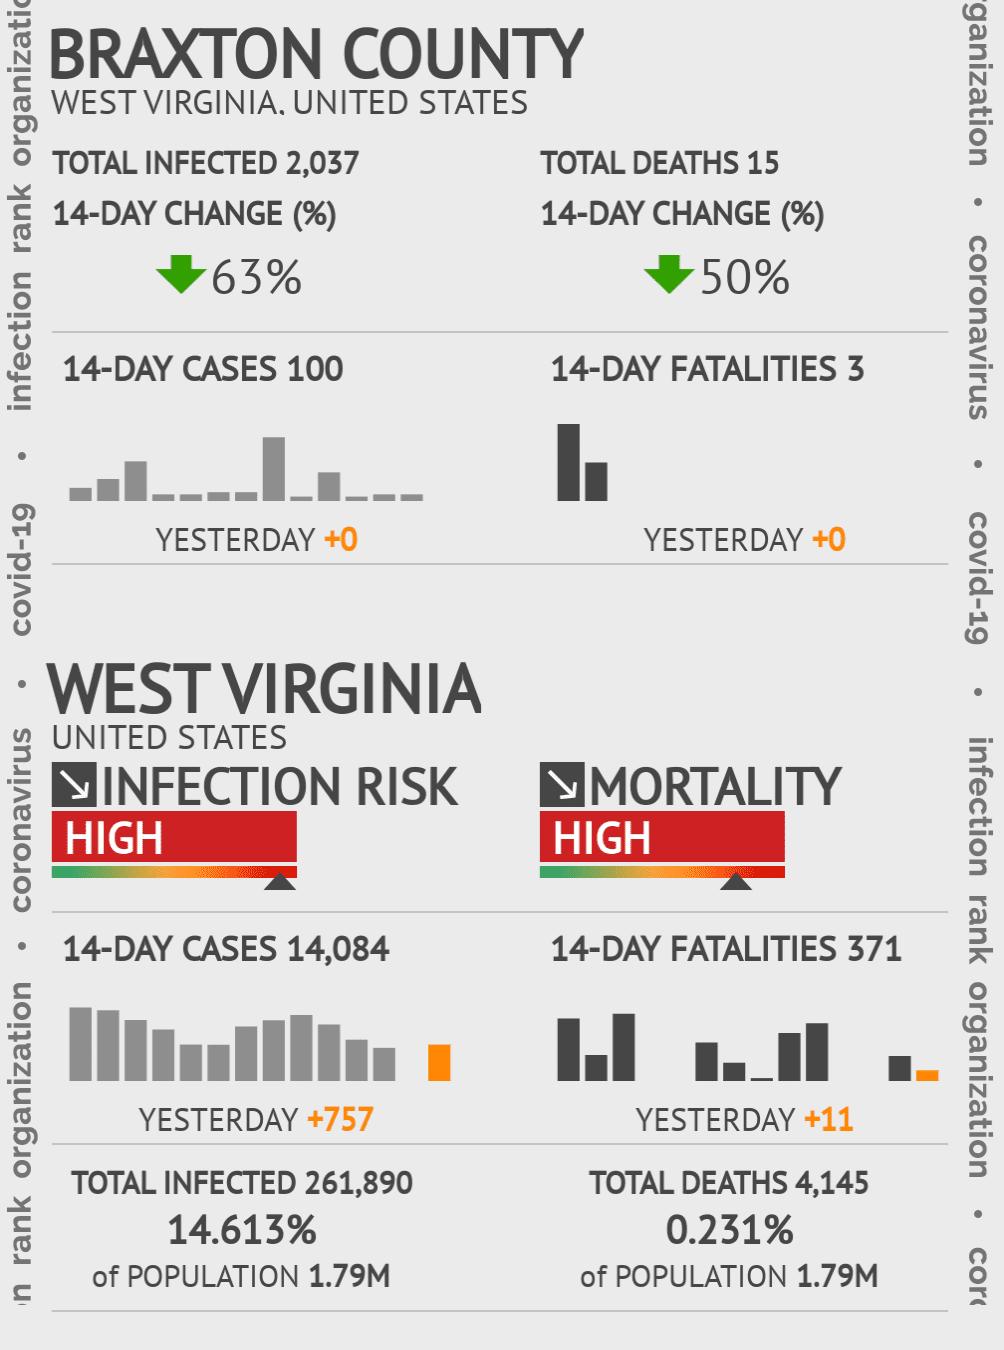 Braxton County Coronavirus Covid-19 Risk of Infection on July 24, 2021